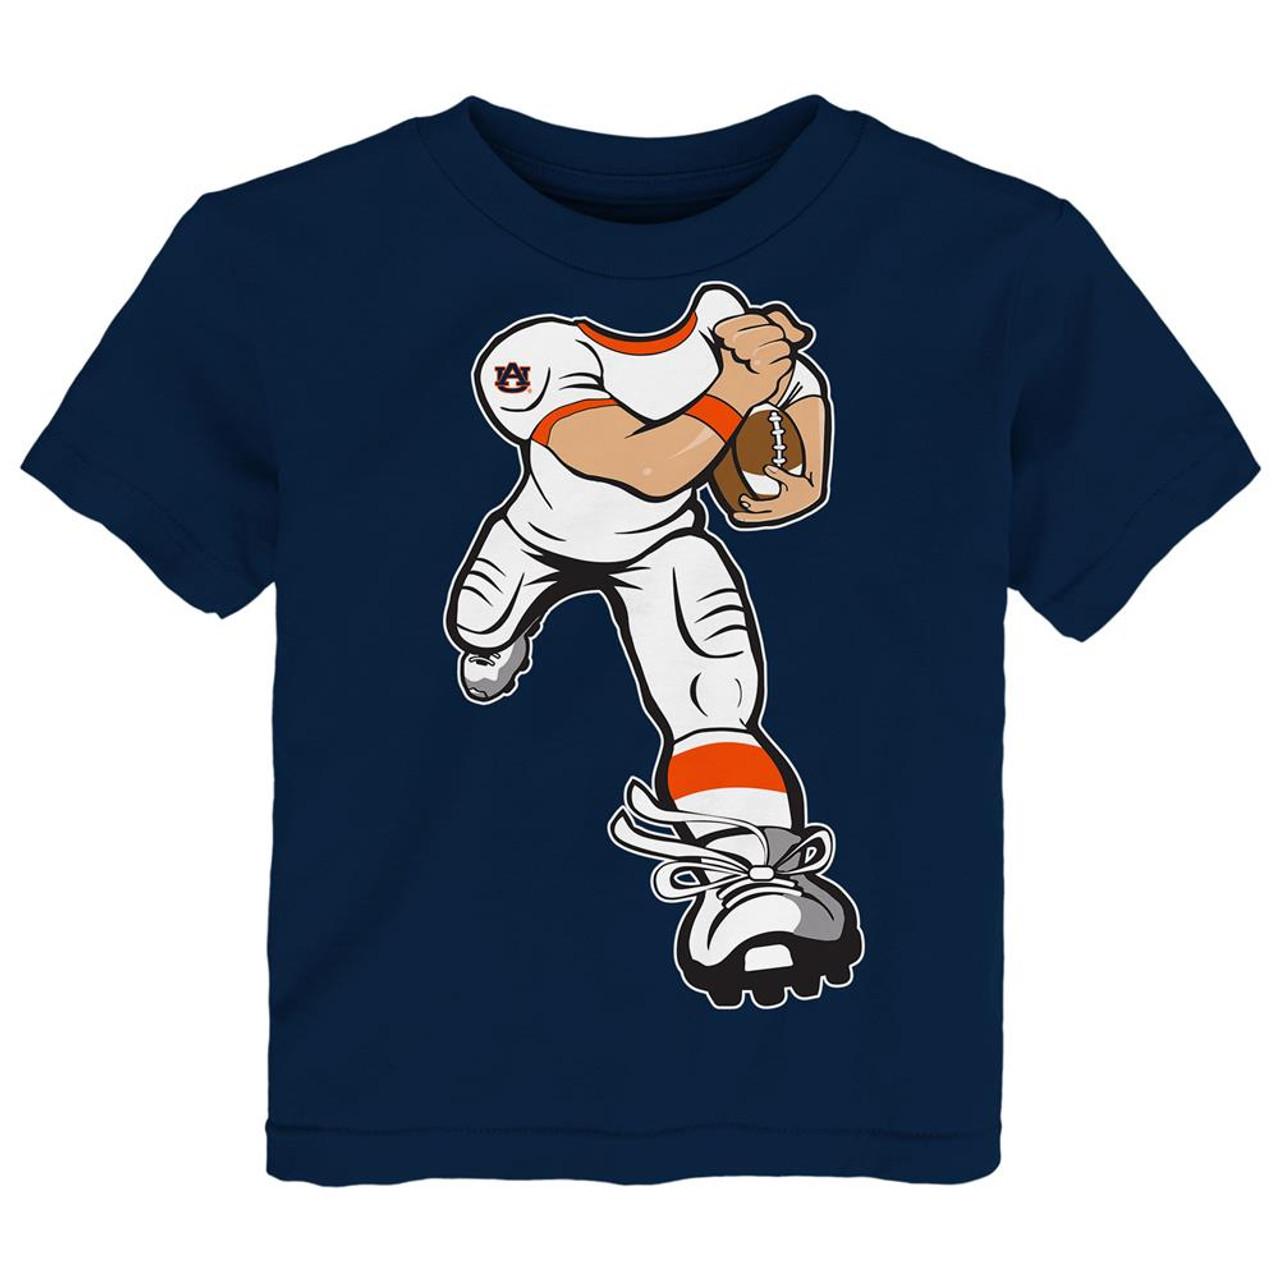 Toddler Auburn University Tigers Tee Yard Rush Toddler T-Shirt